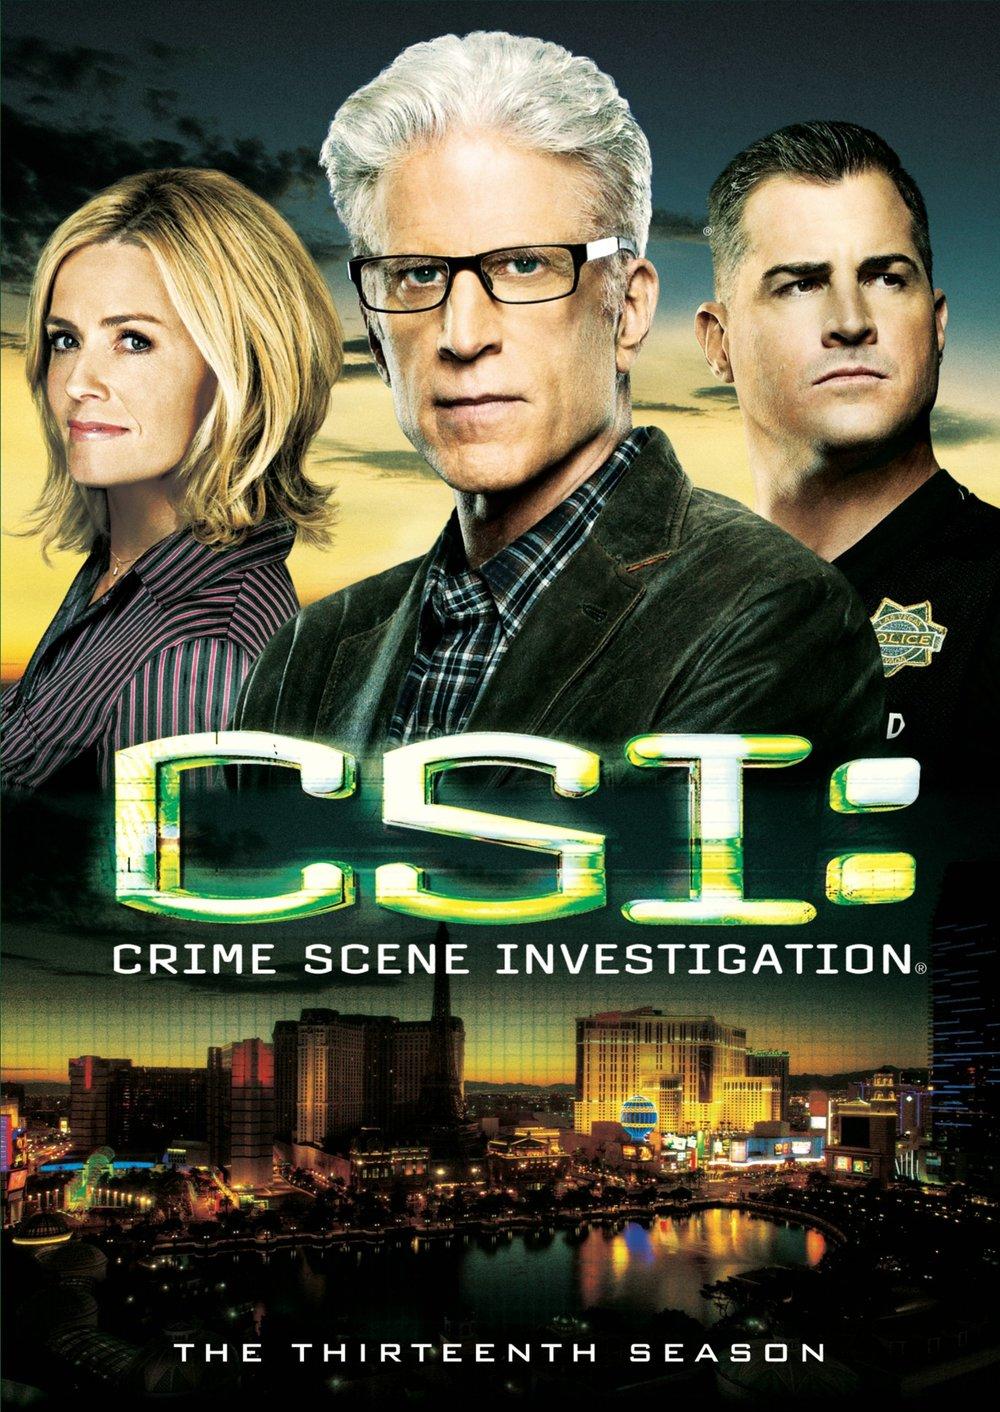 csi crime scene investigation.jpg